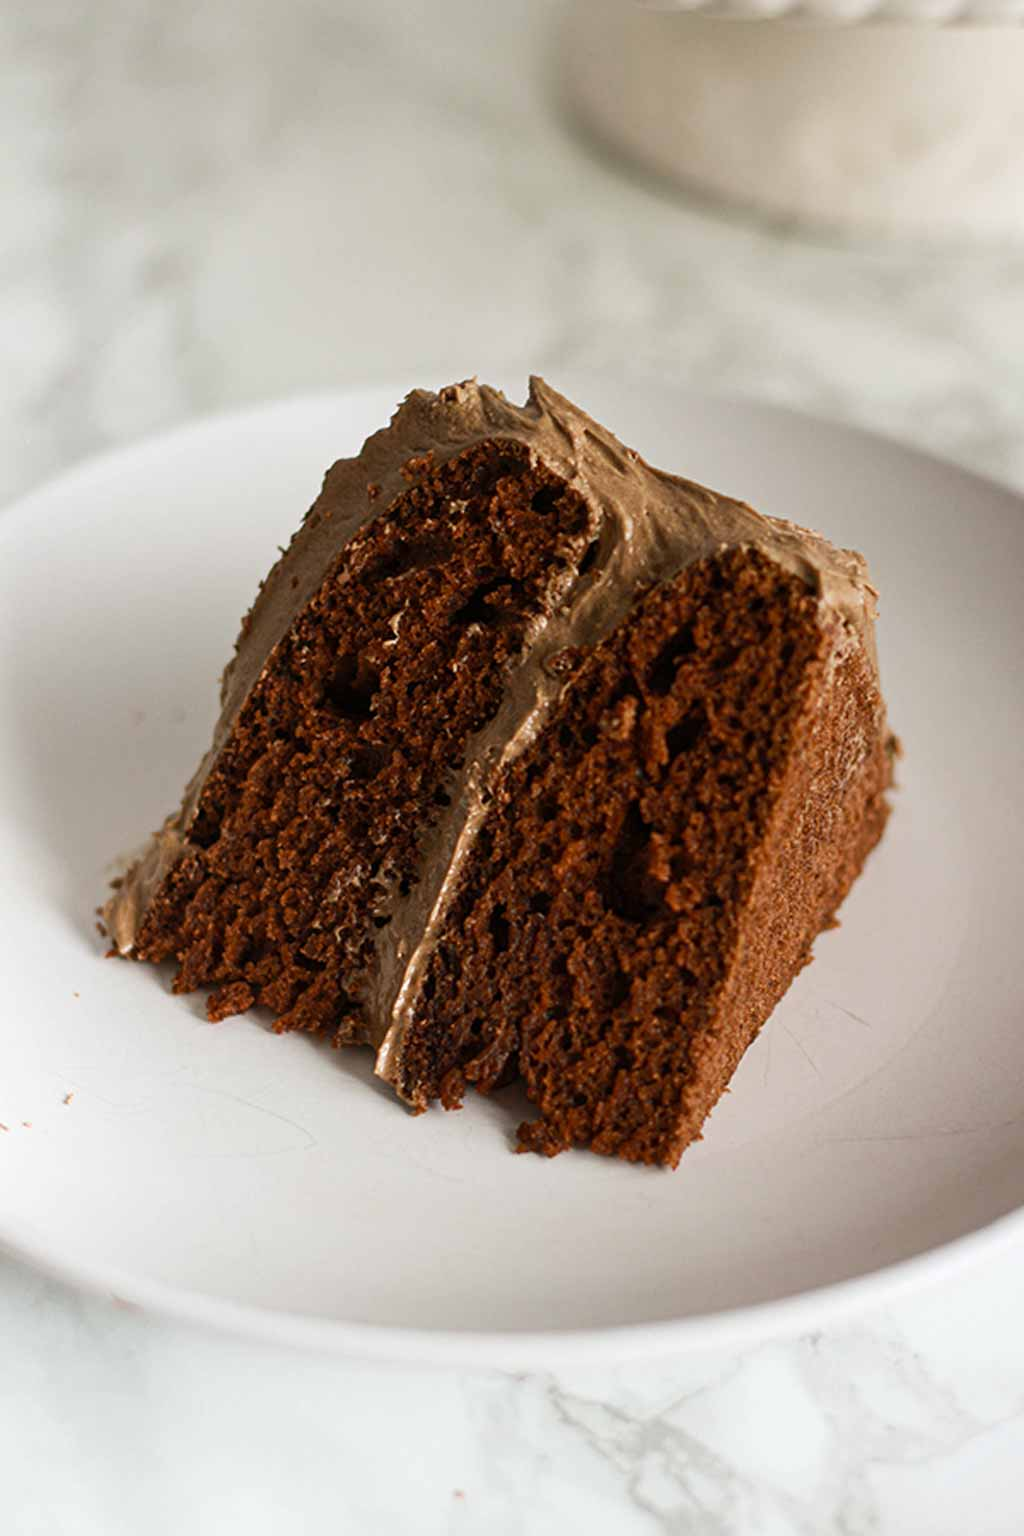 Slice Of Chocolate Fudge Cake On A Plate